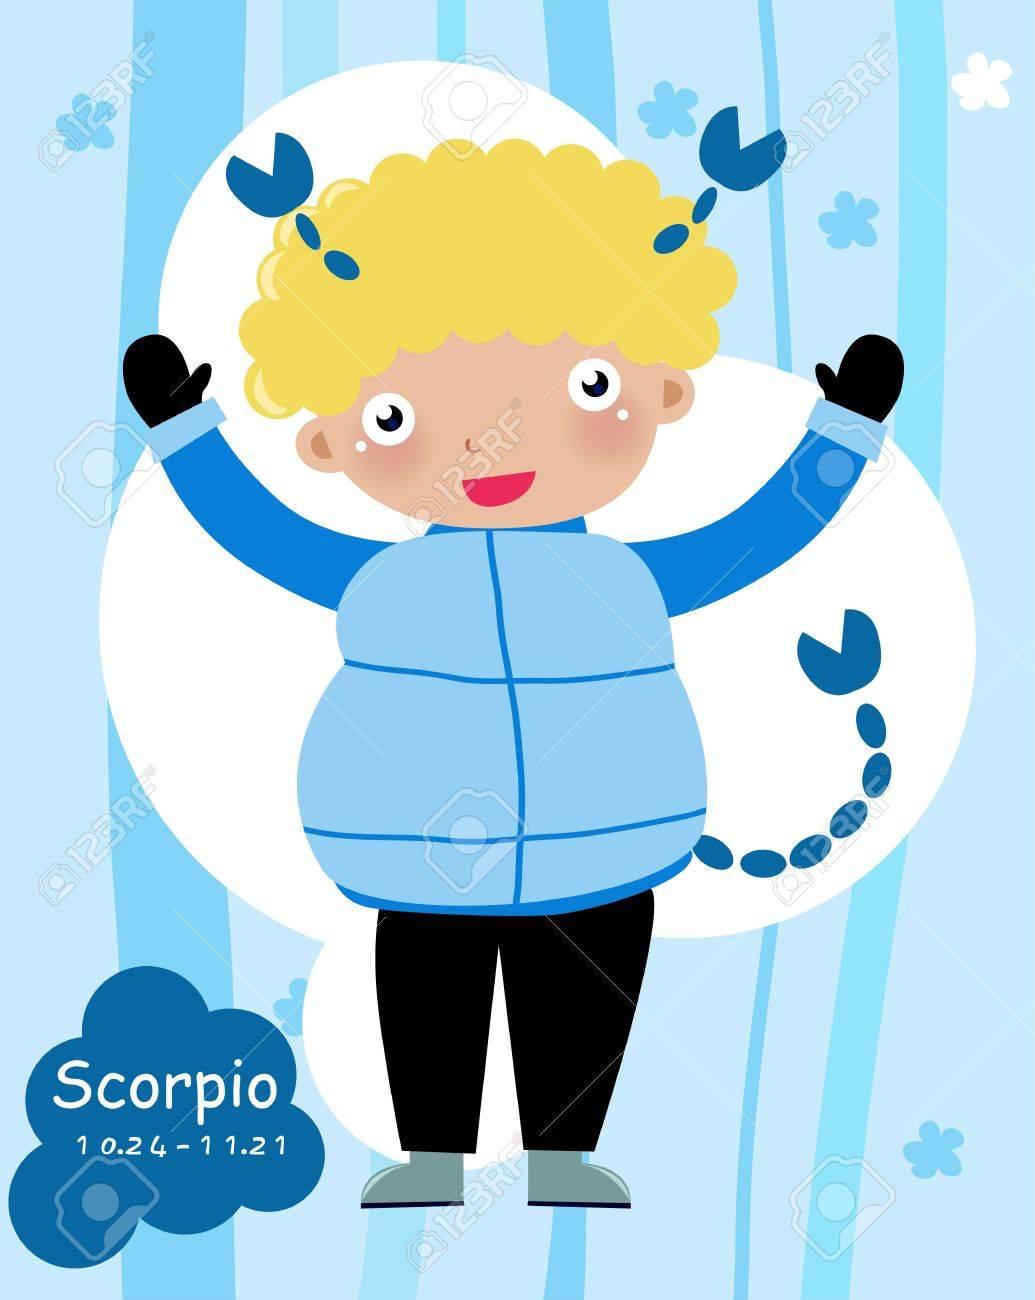 Scorpio Child - (10 of 12) Stock Vector - 8887112